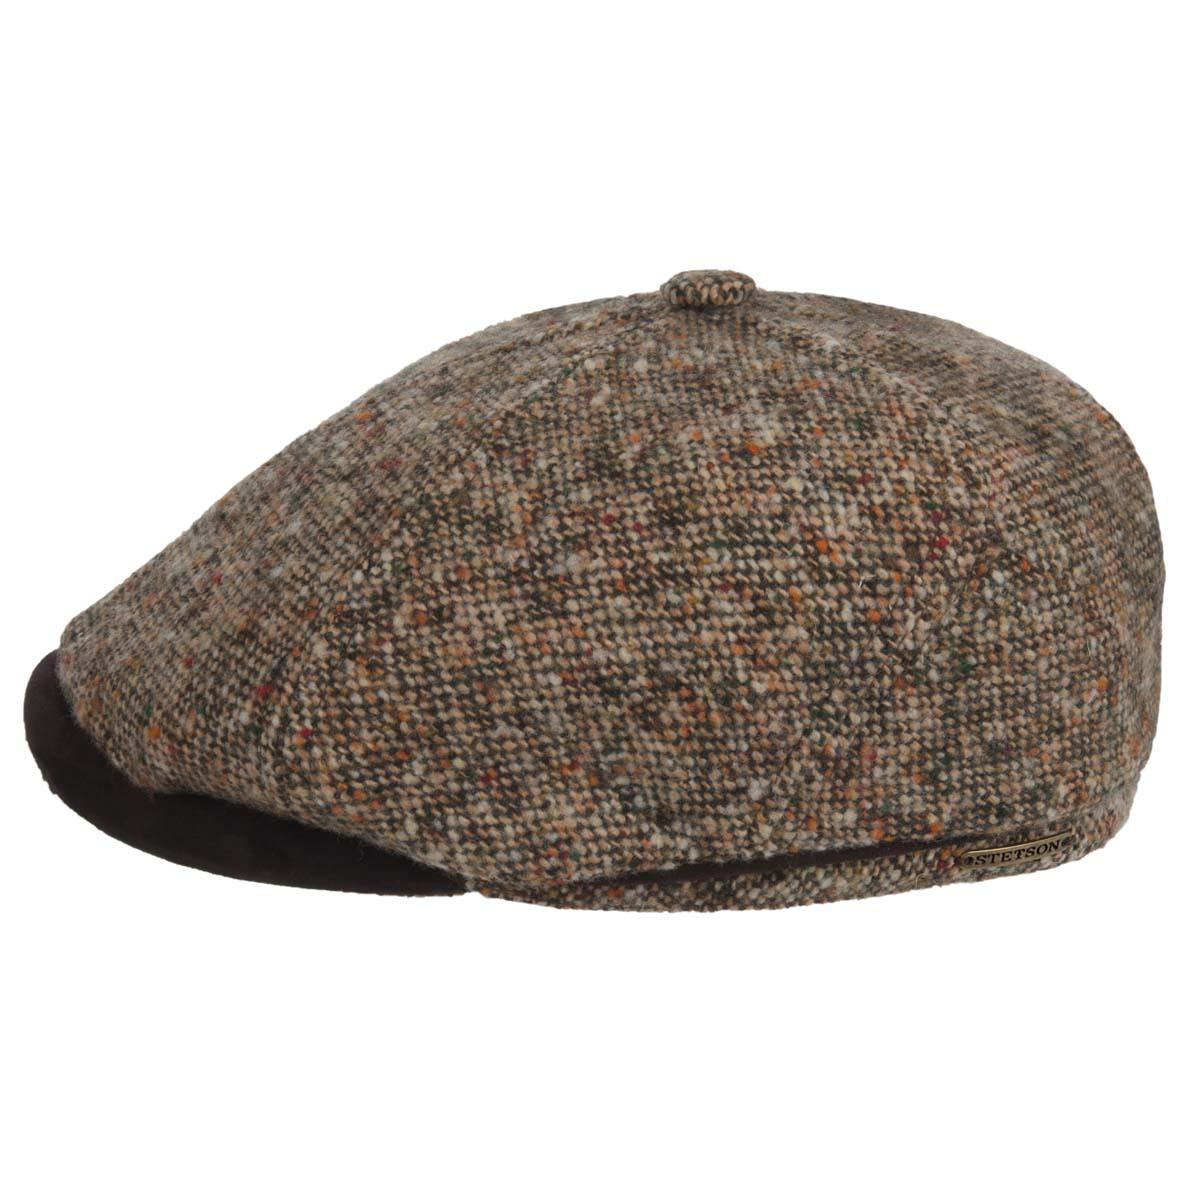 9ee3b604e2700 Trendy flat cap signed Stetson